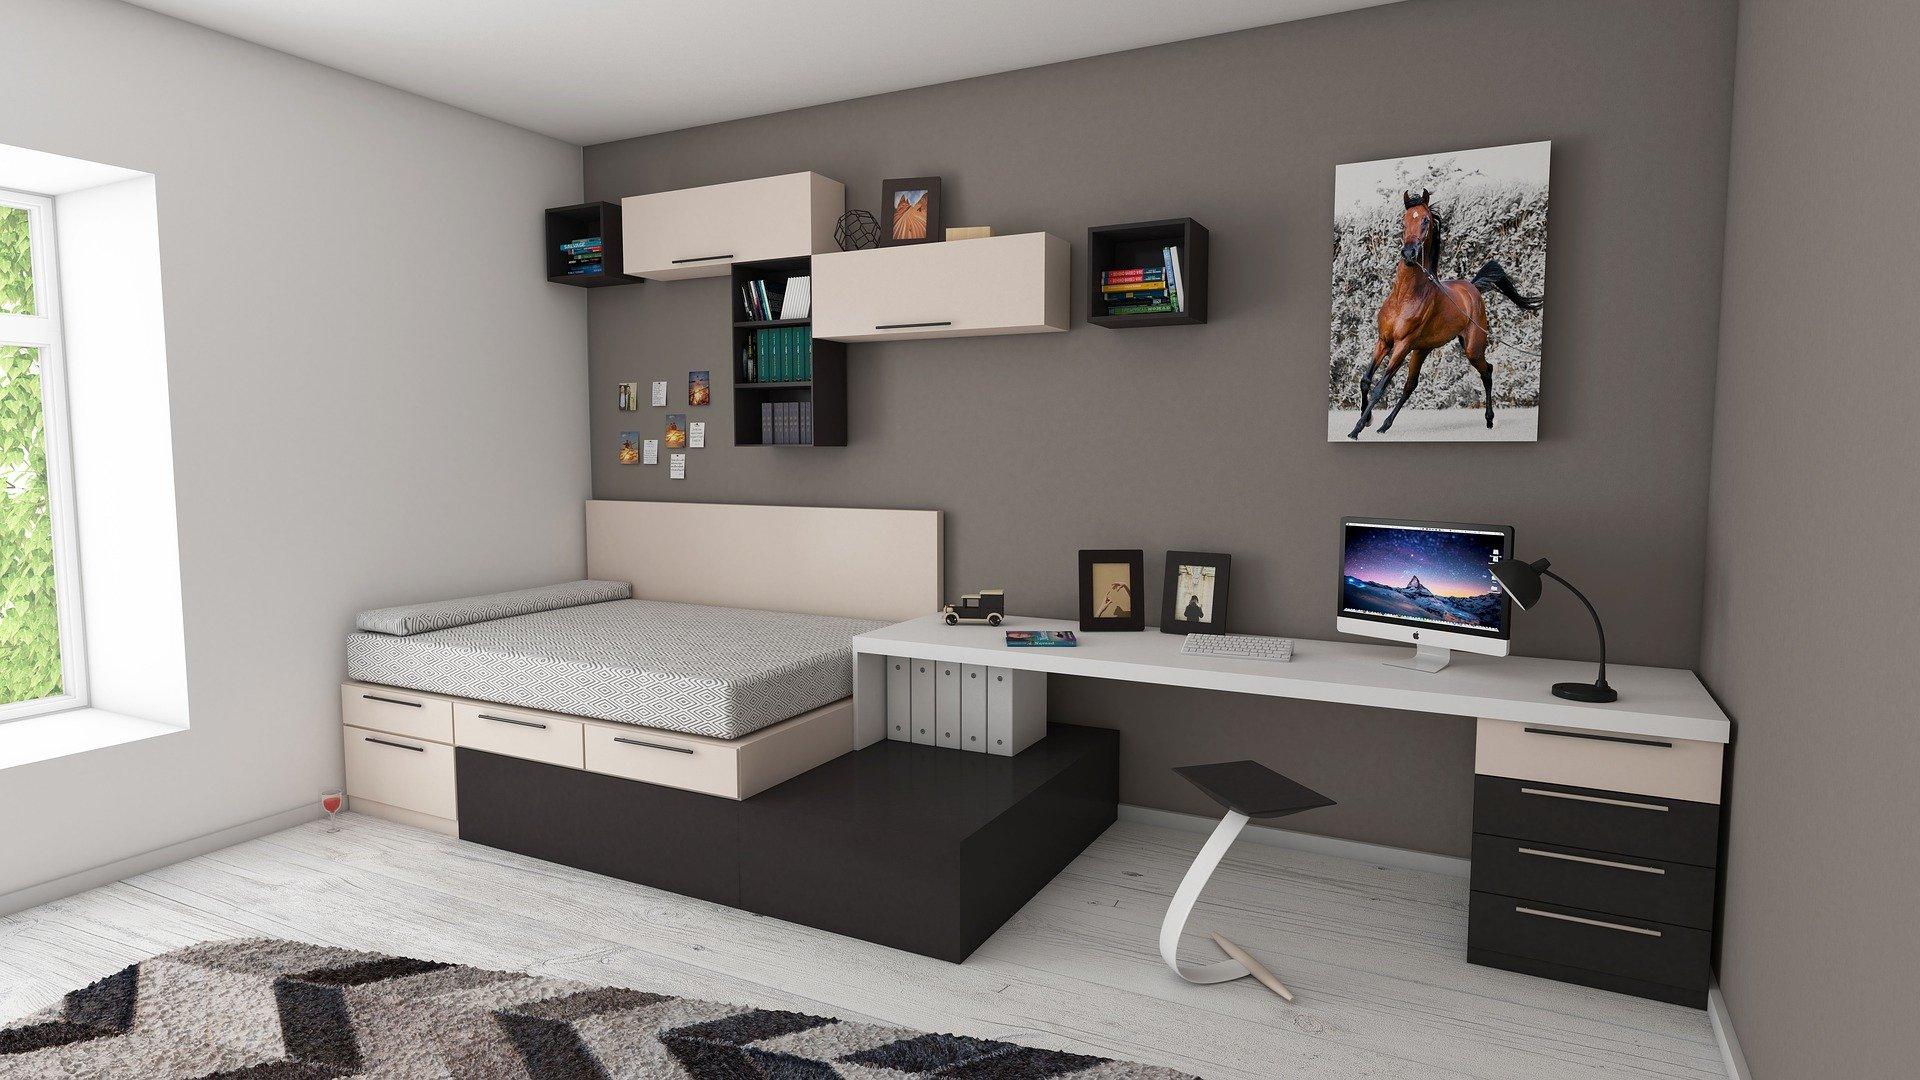 multifunctional bedroom furniture